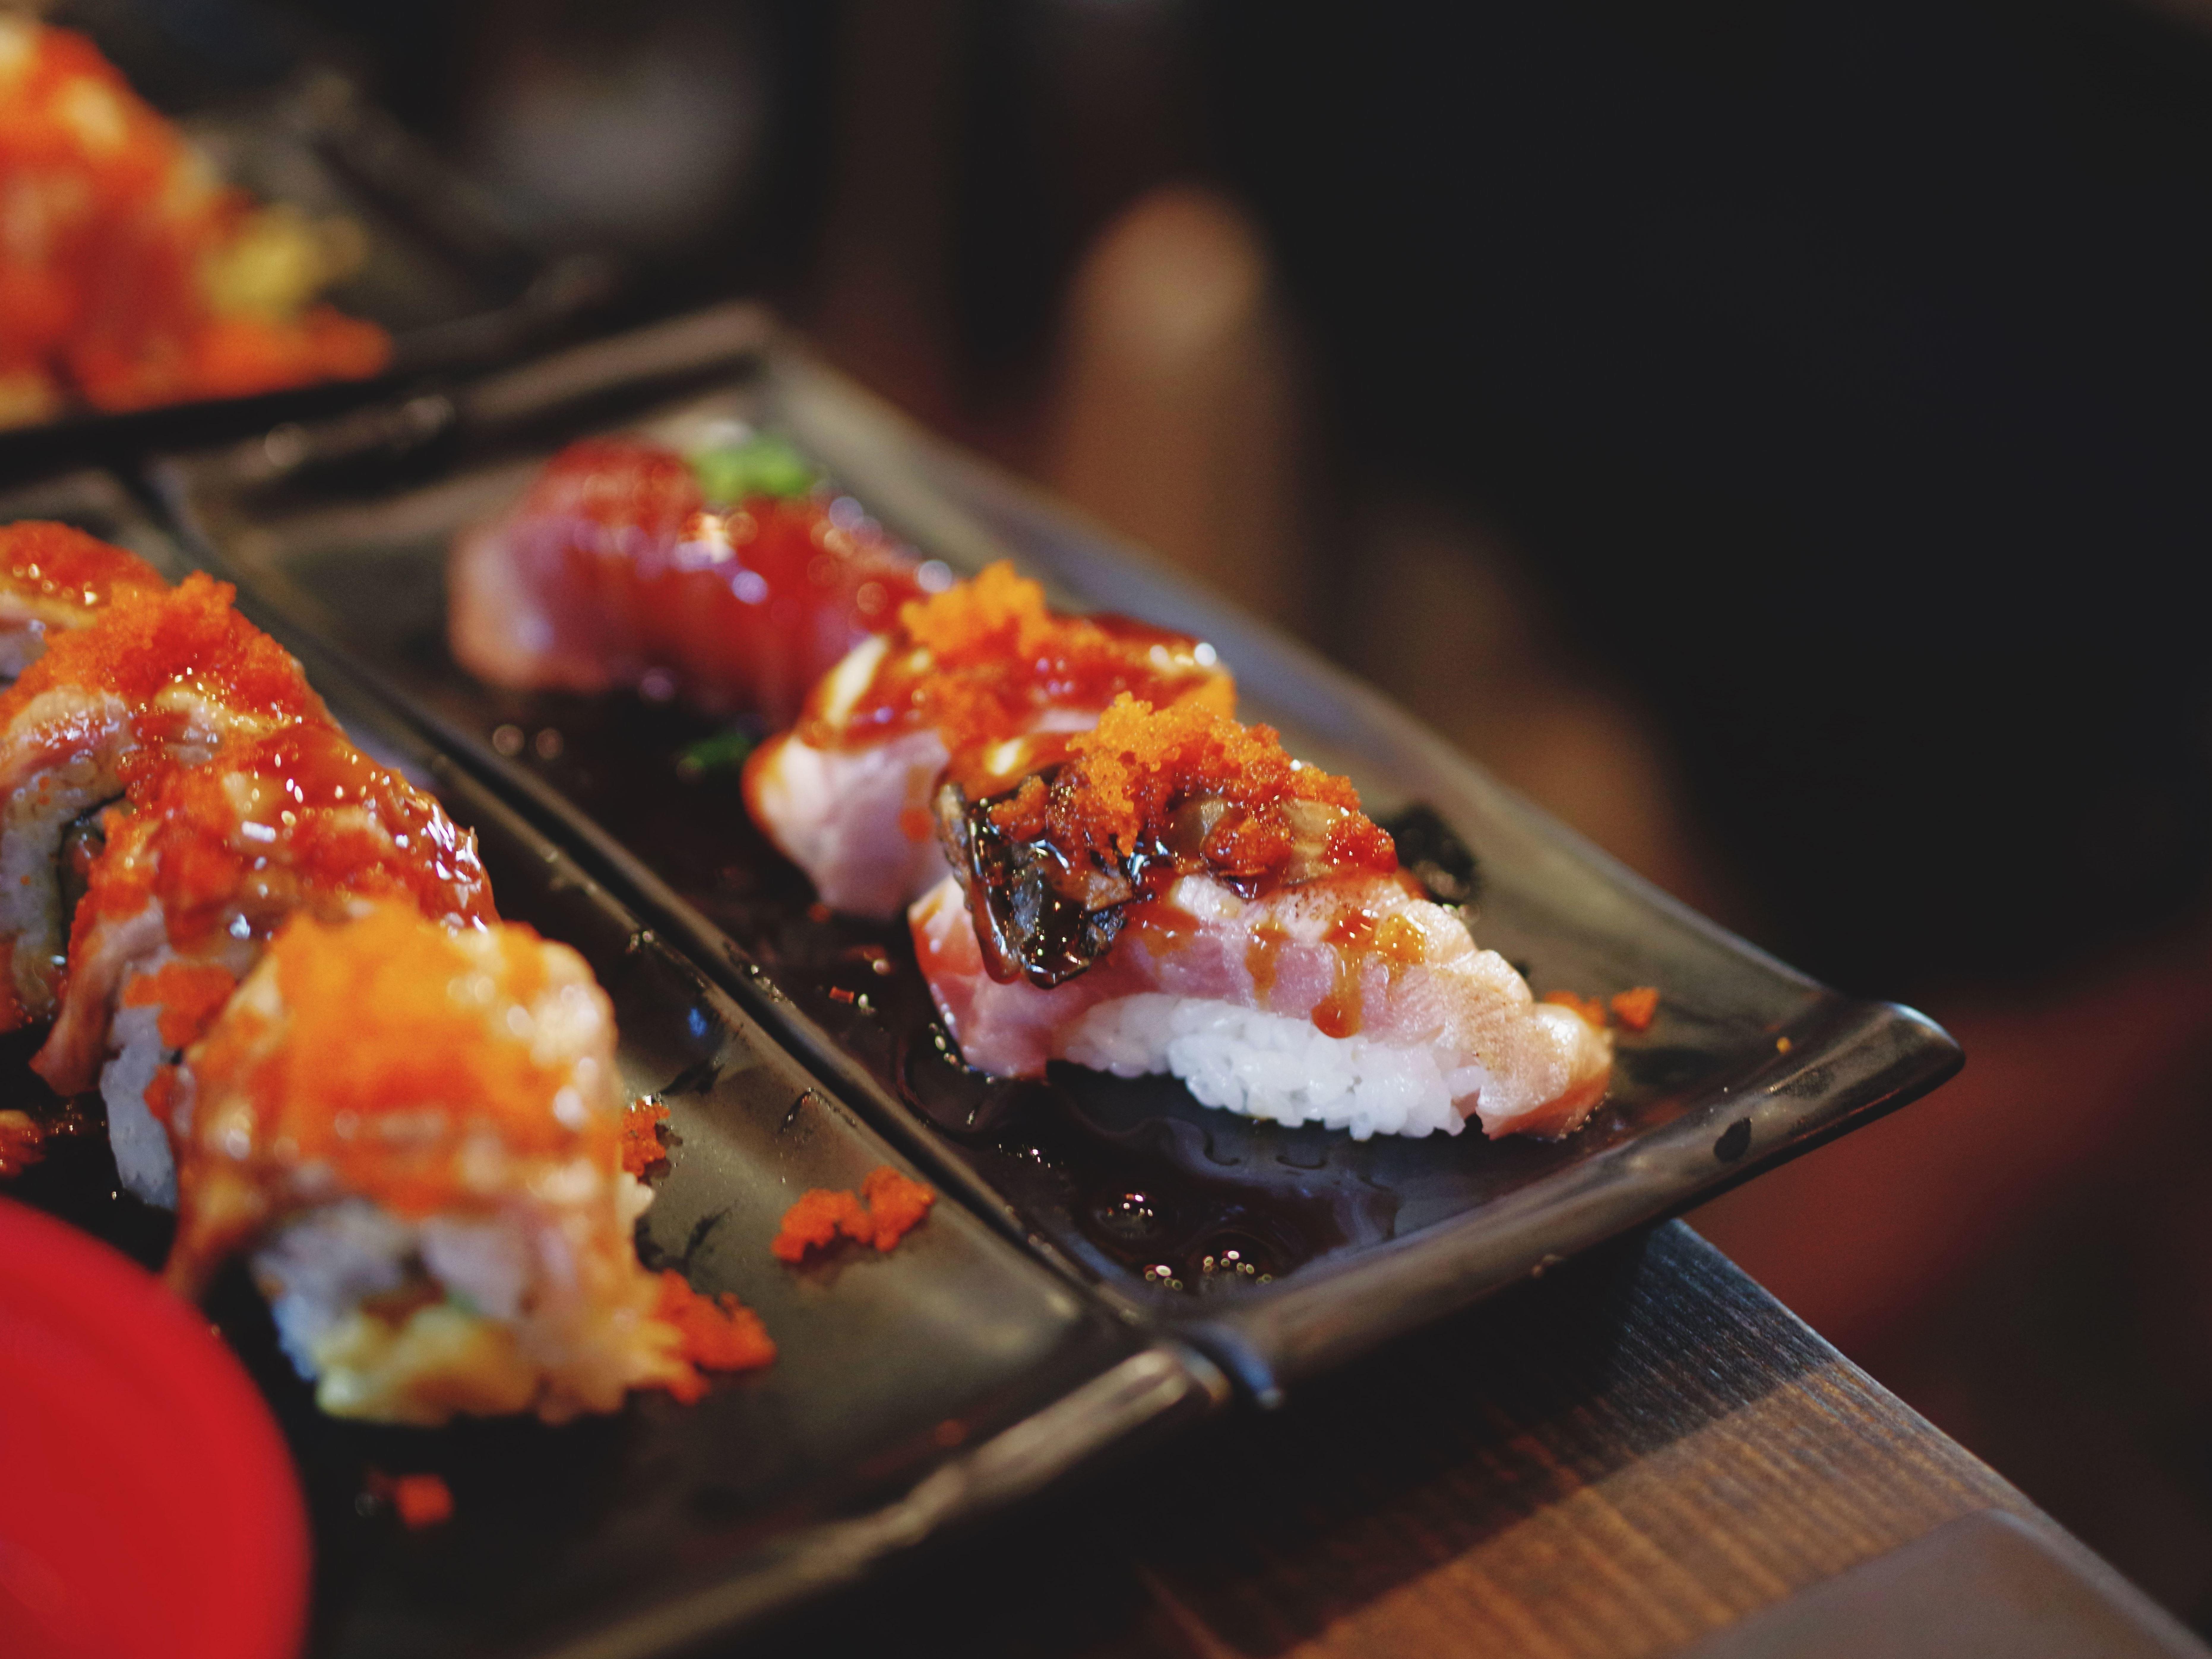 Gambar Gratis Daging Nasi Makanan Laut Sushi Makanan Jepang